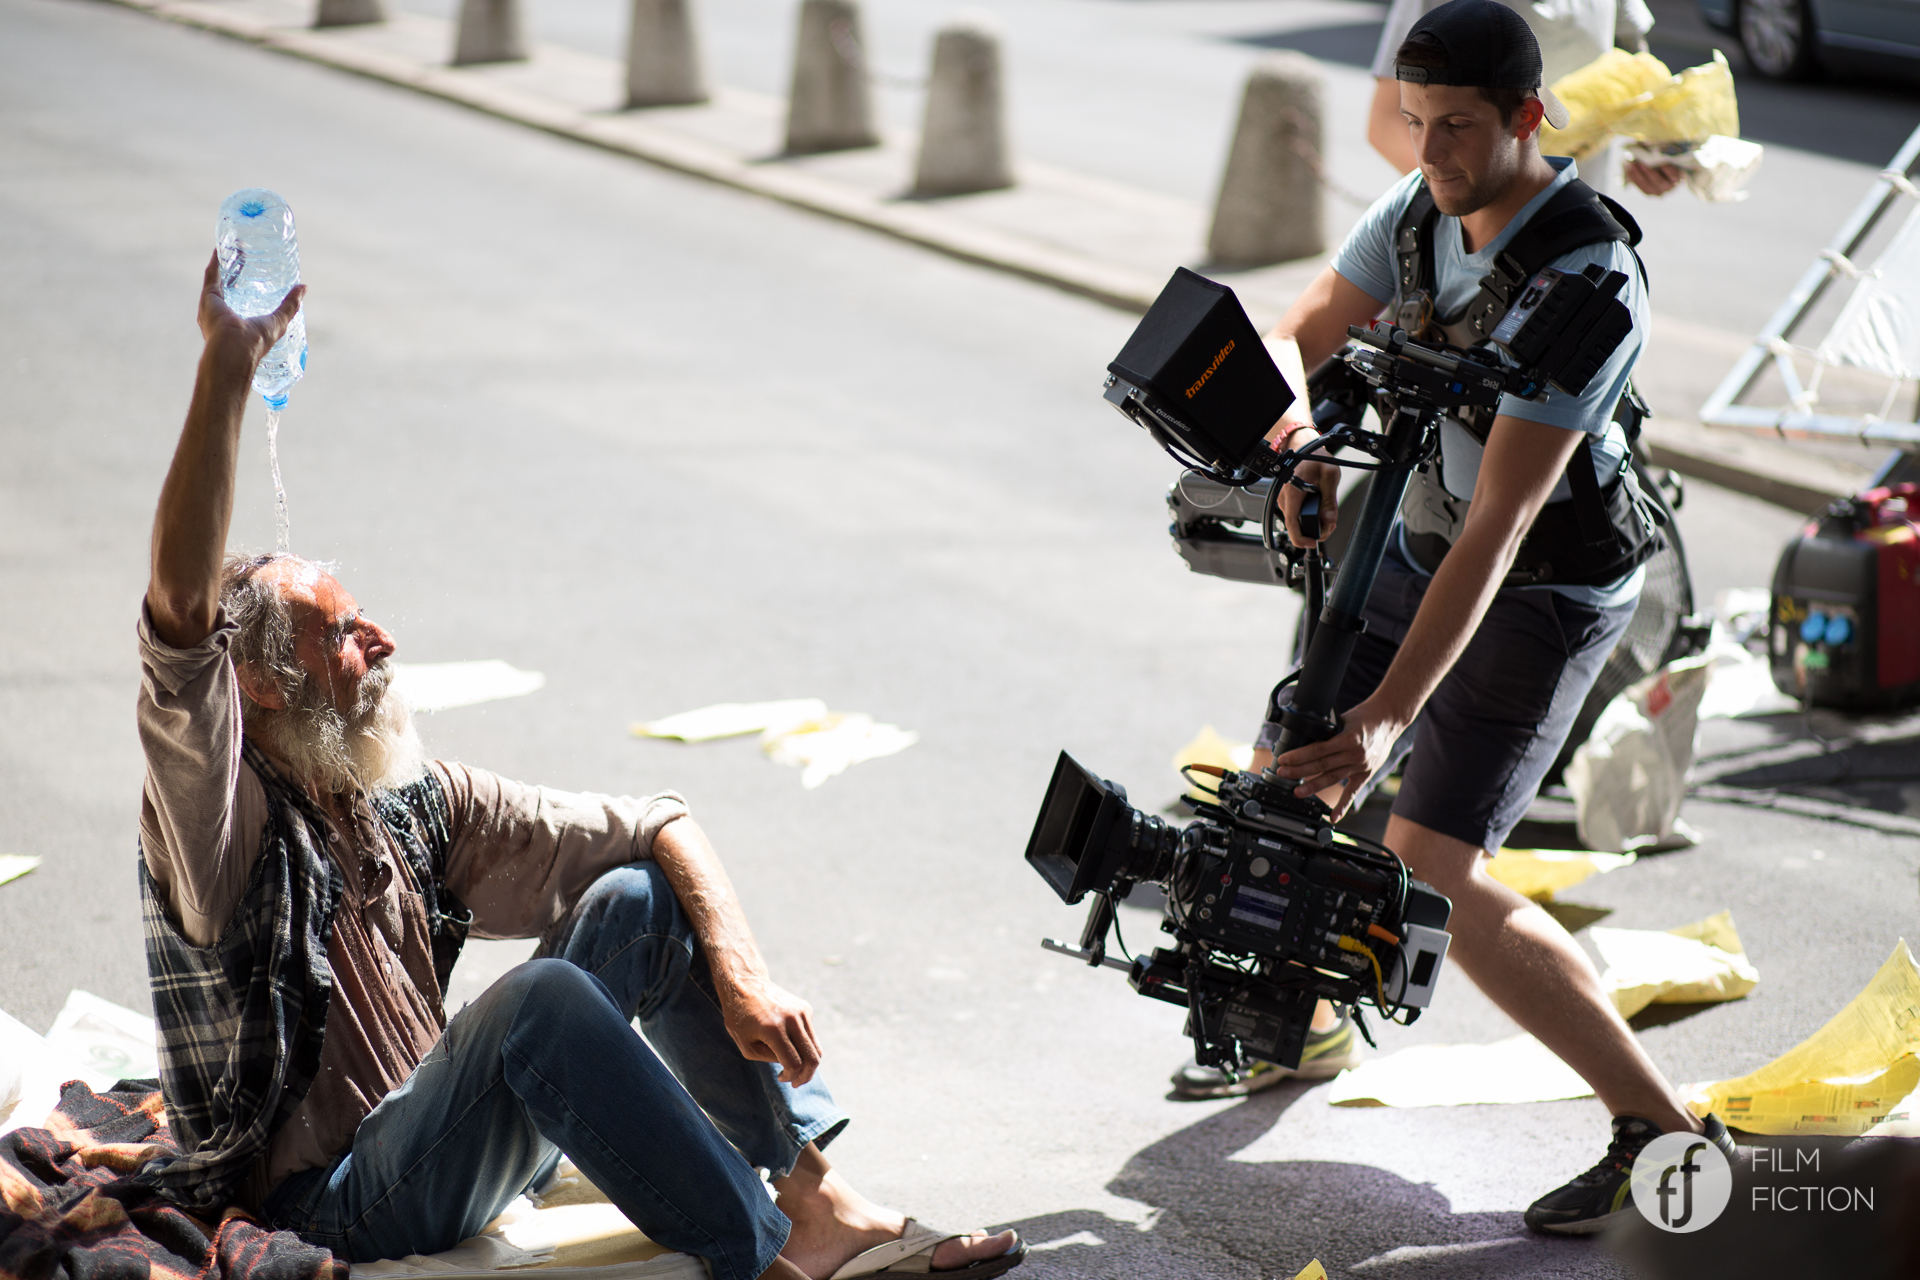 FILM FICTION